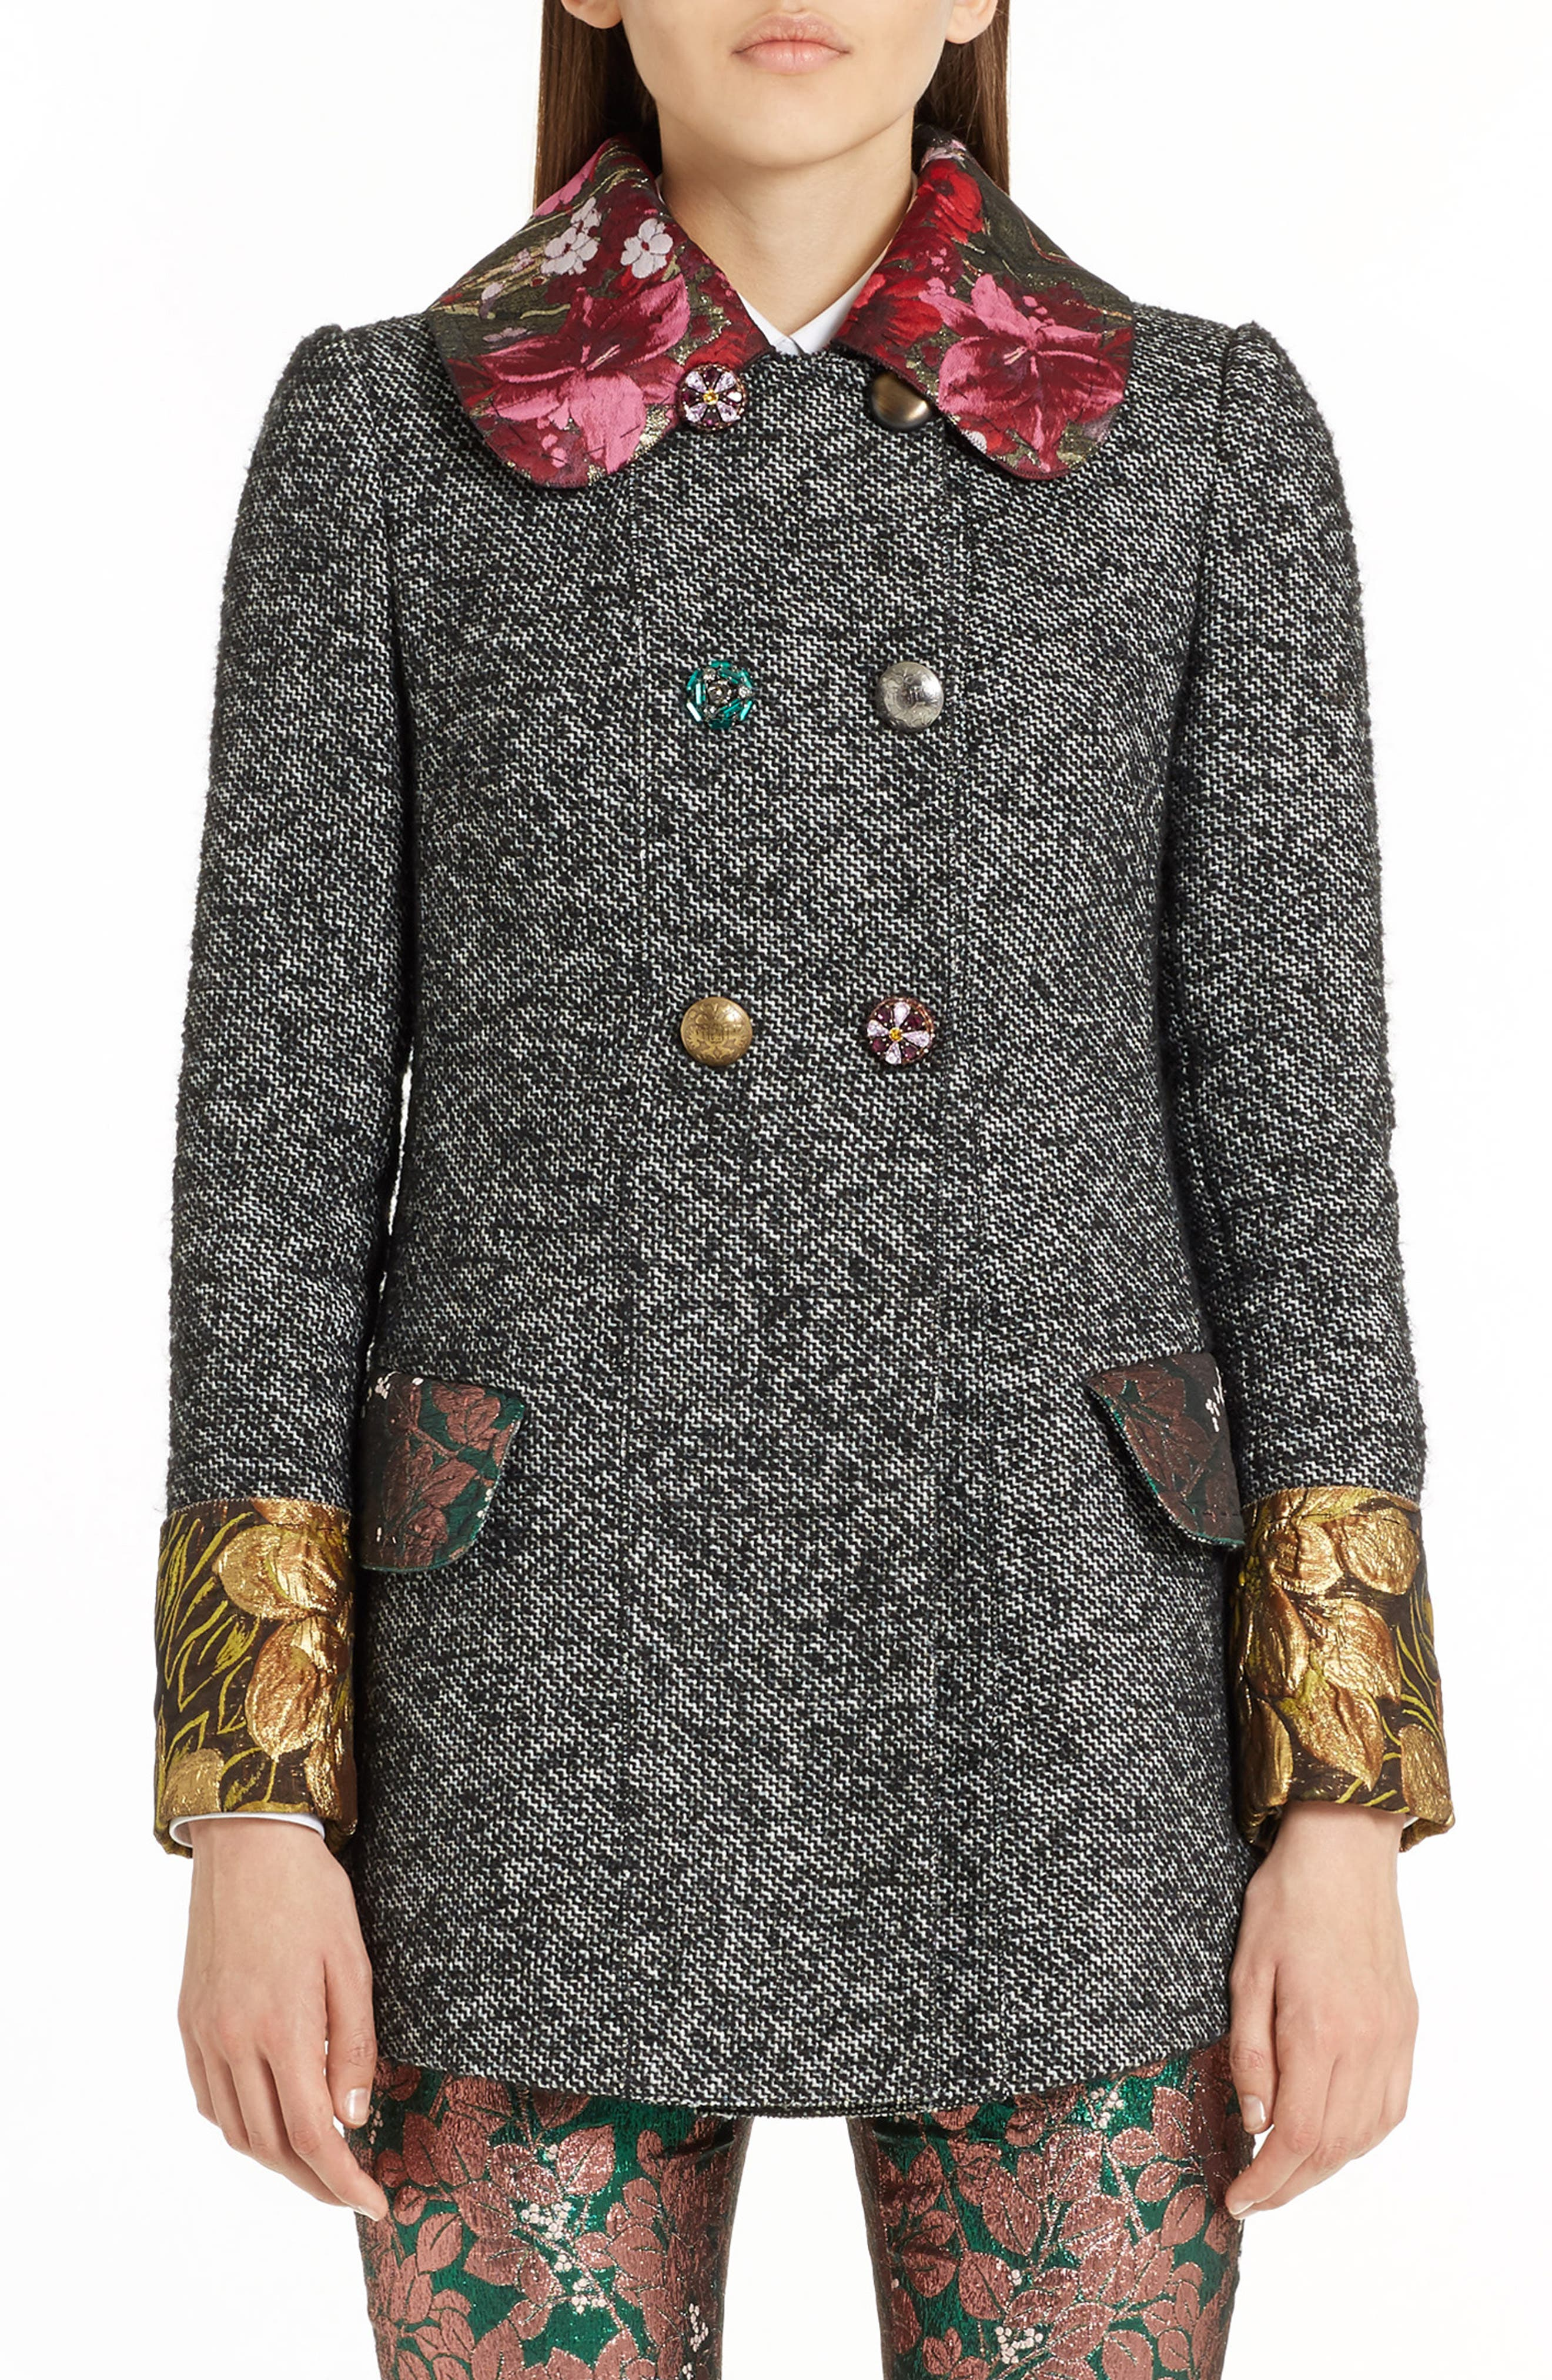 Dolce&Gabbana Jacquard Trim Tweed Coat